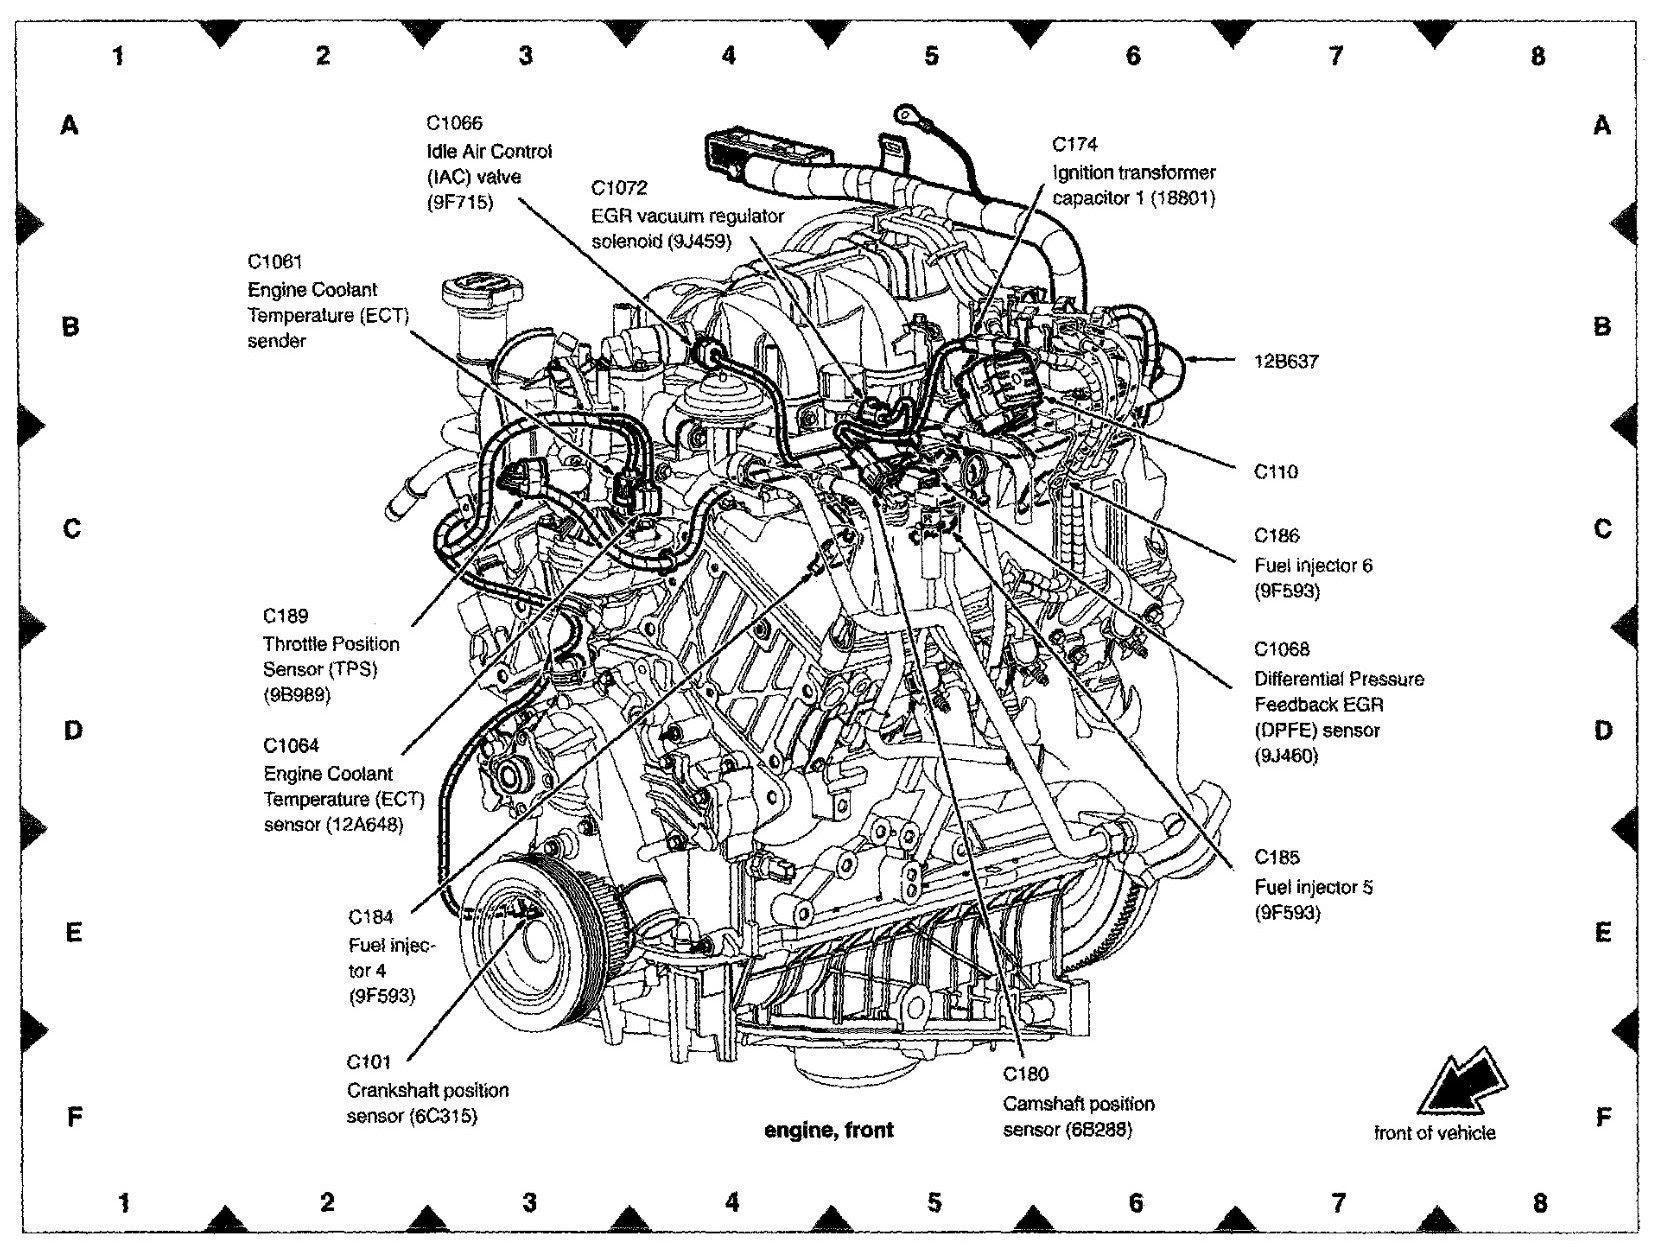 Diagram 2005 Ford Explorer Engine Diagram Full Version Hd Quality Engine Diagram Casewiring Villaroveri It